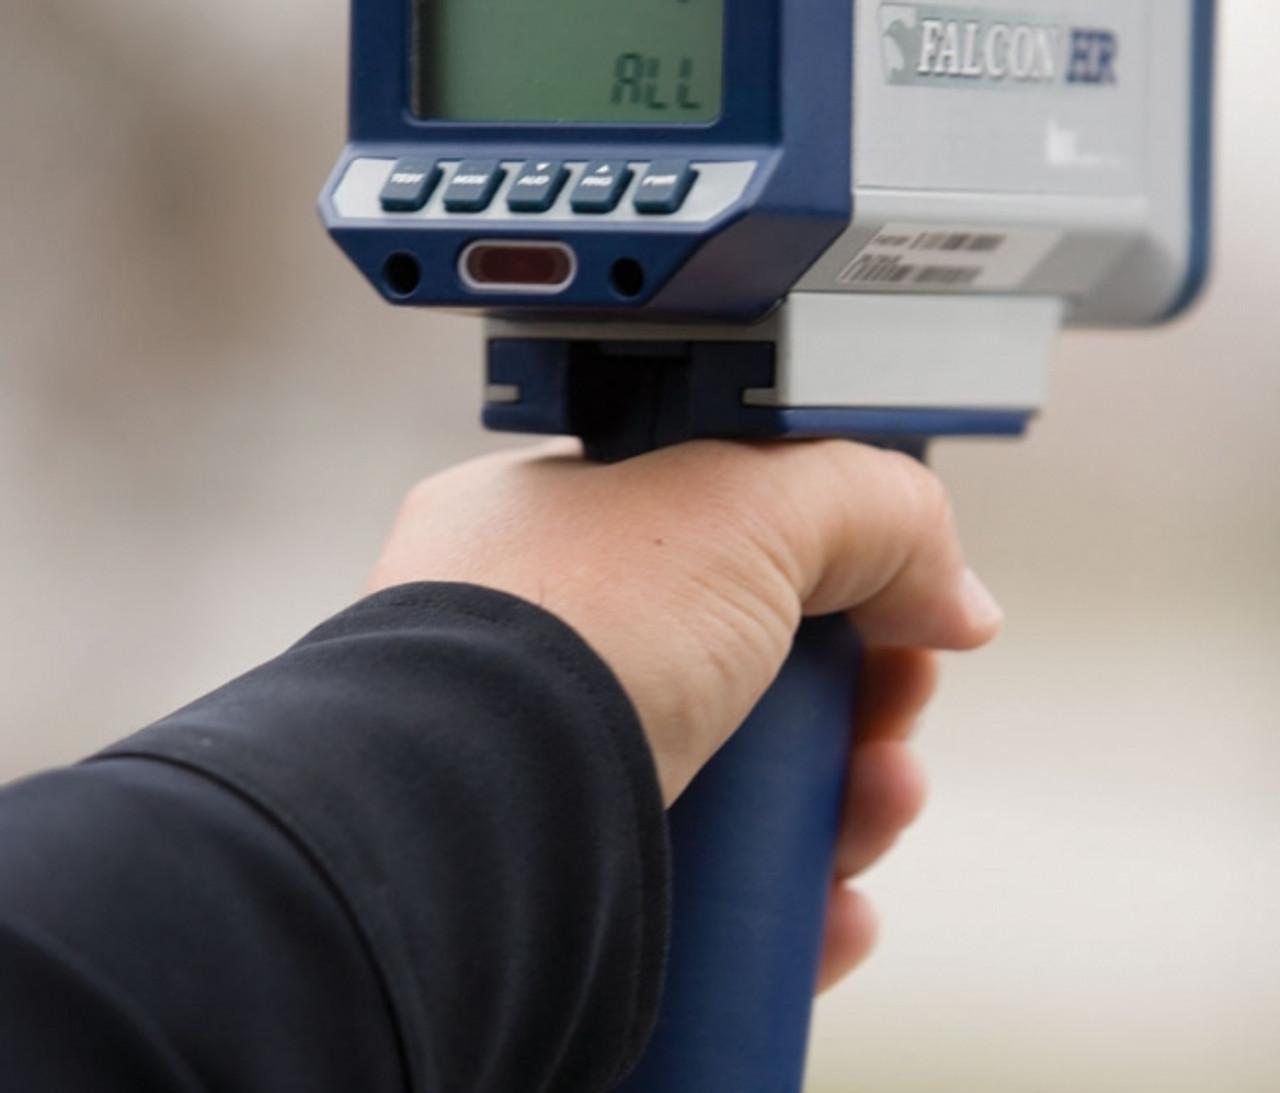 Kustom Signals Falcon HR Police Radar Gun, Hand-held or Dash Mount, corded or cordless handle